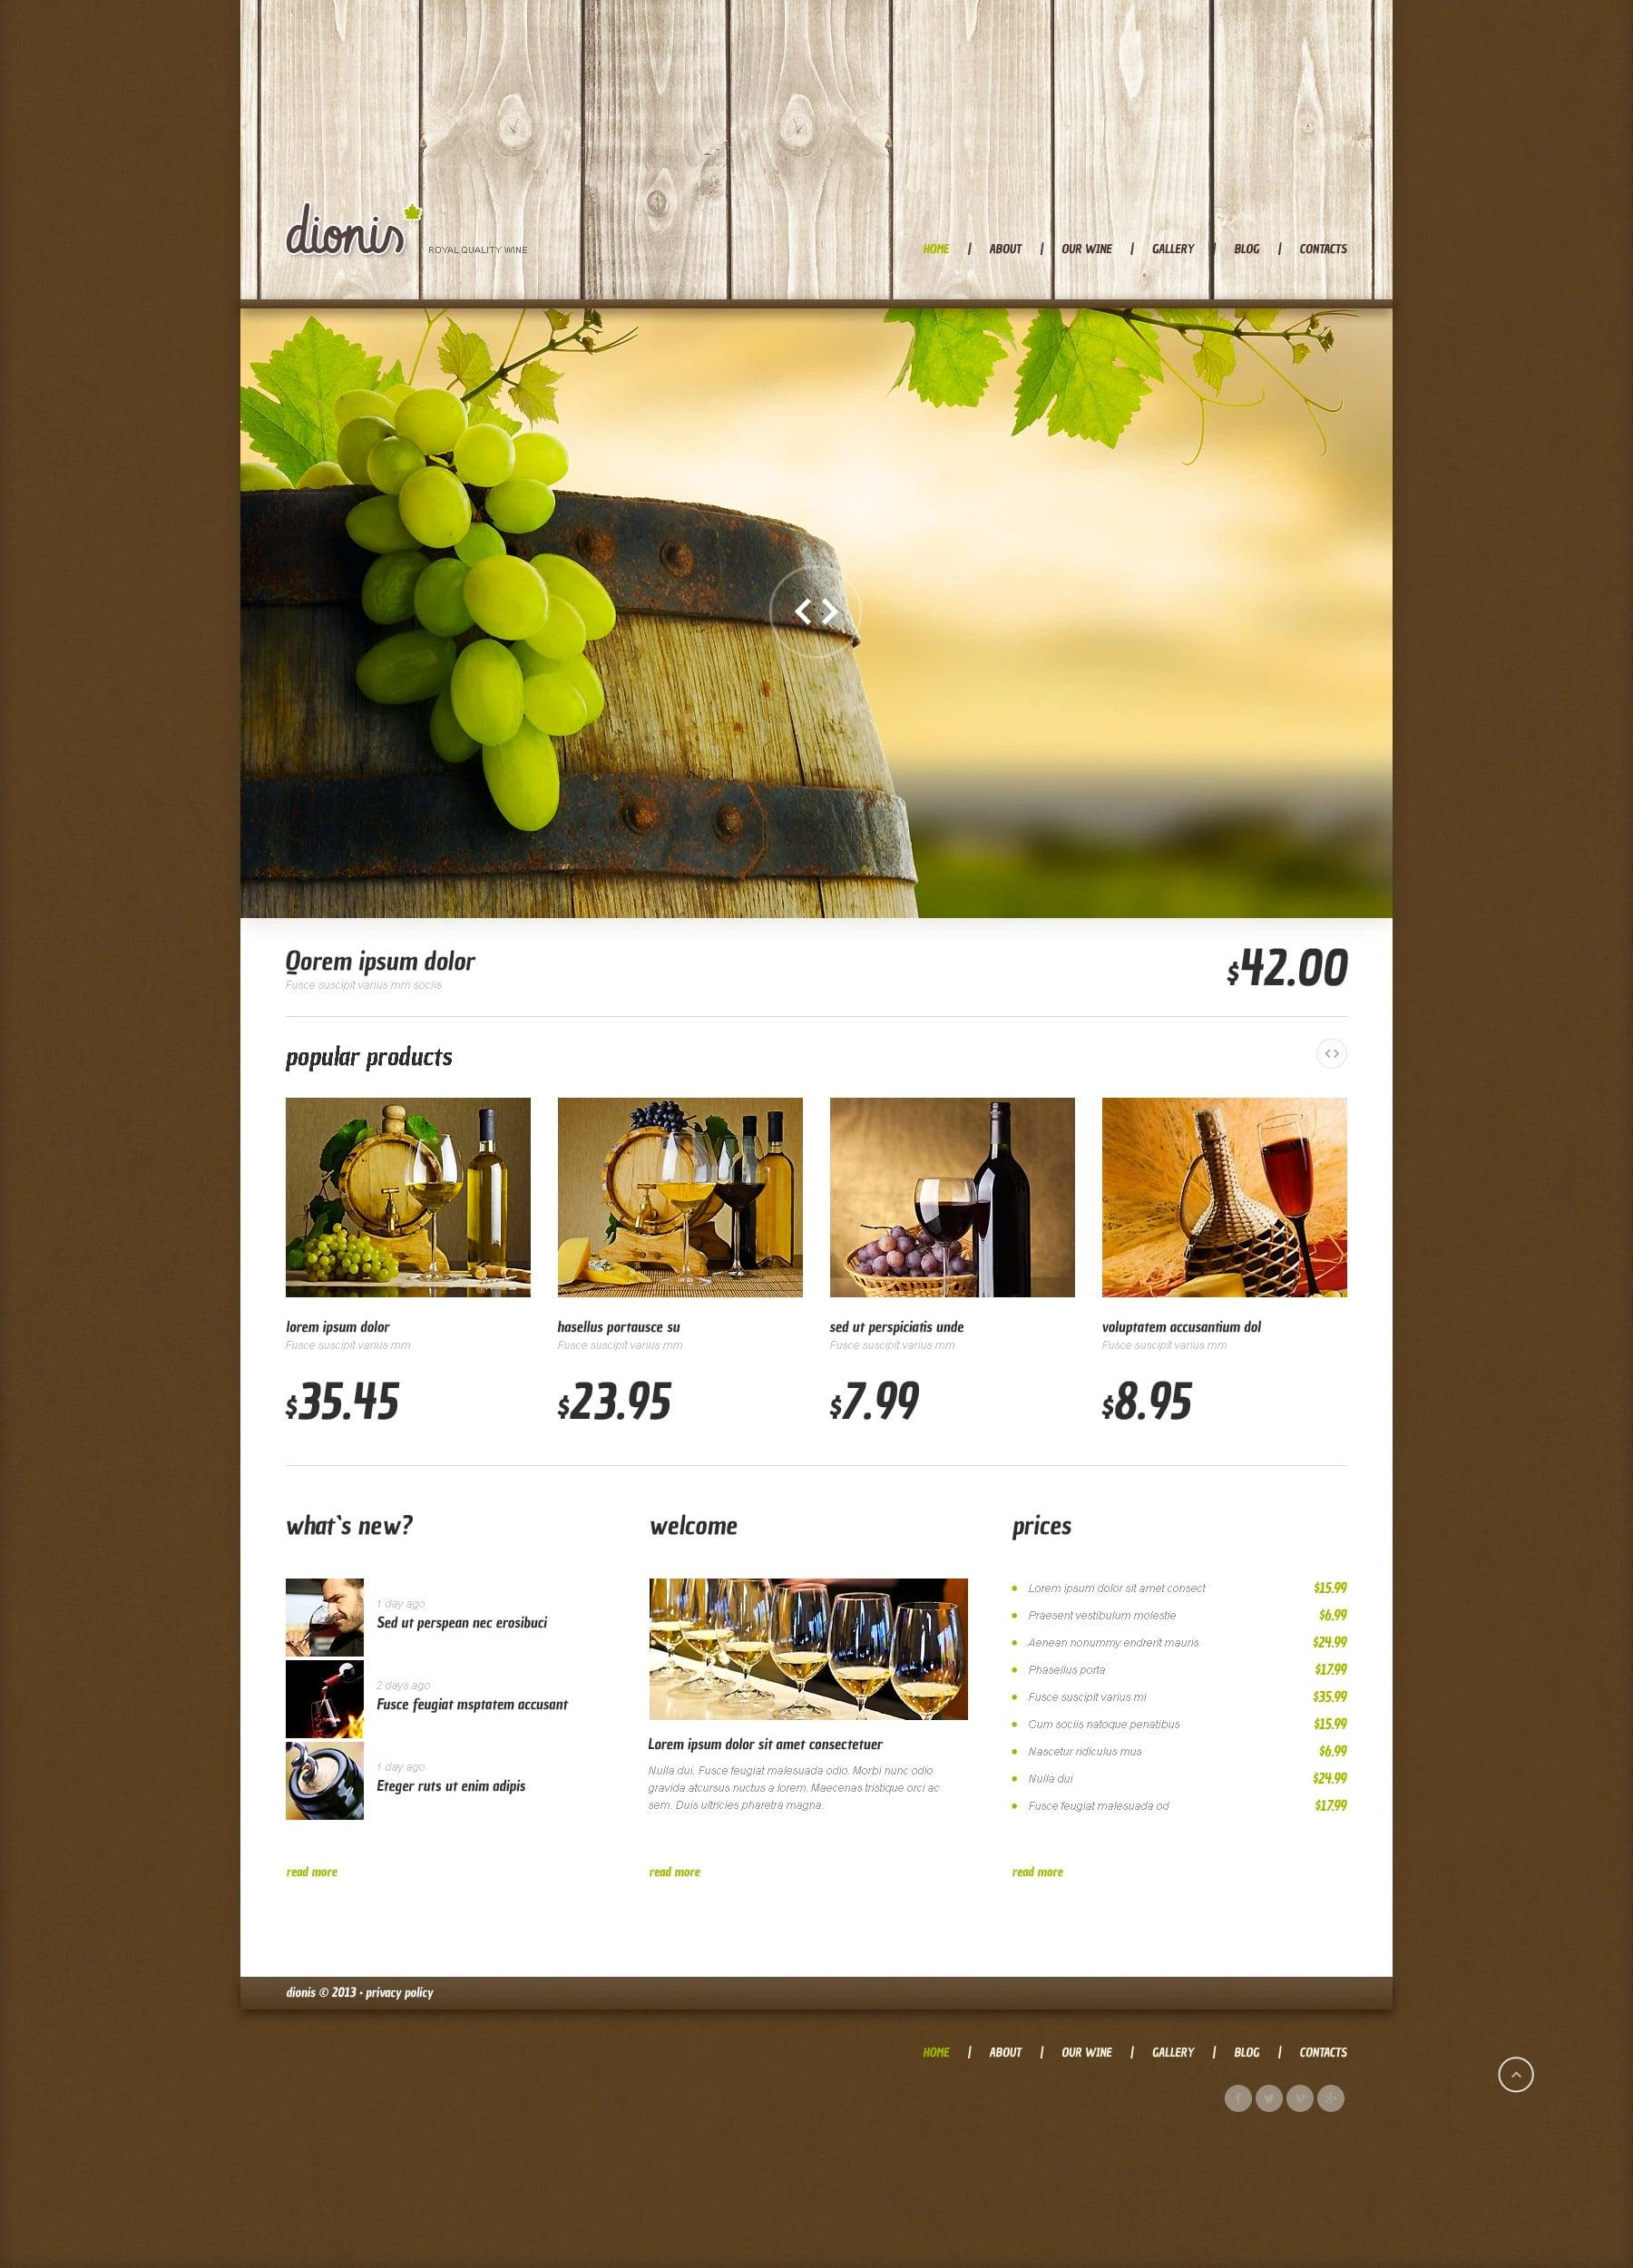 WordPress Food Blog Themes - 10 Premium WP Templates - Untitled 7